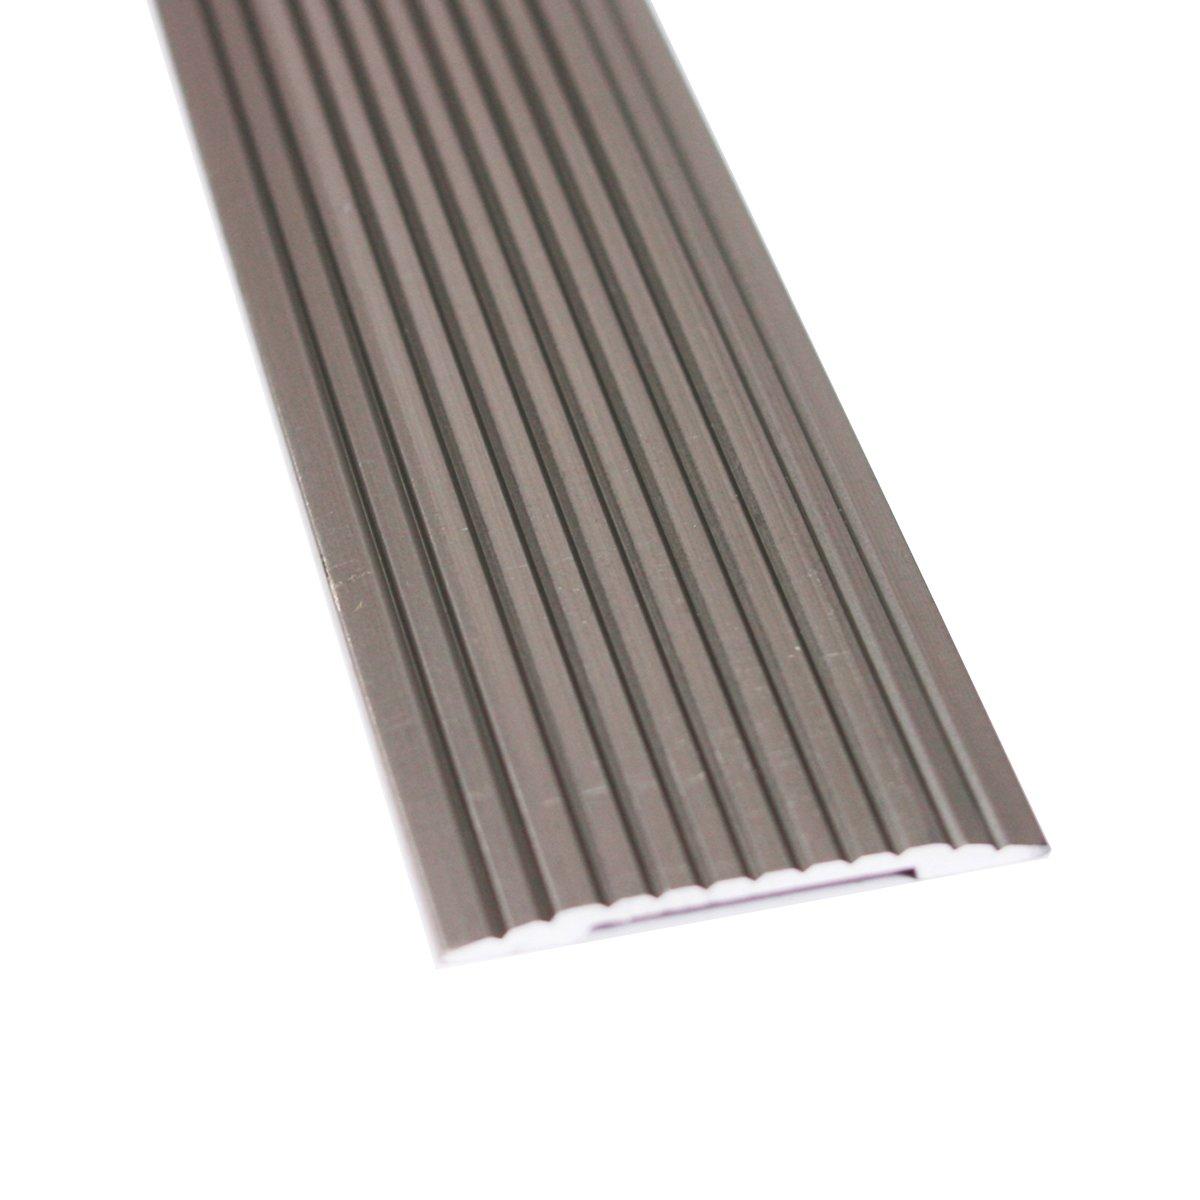 Handrails sills ventilation images frompo - Exterior door threshold extension ...